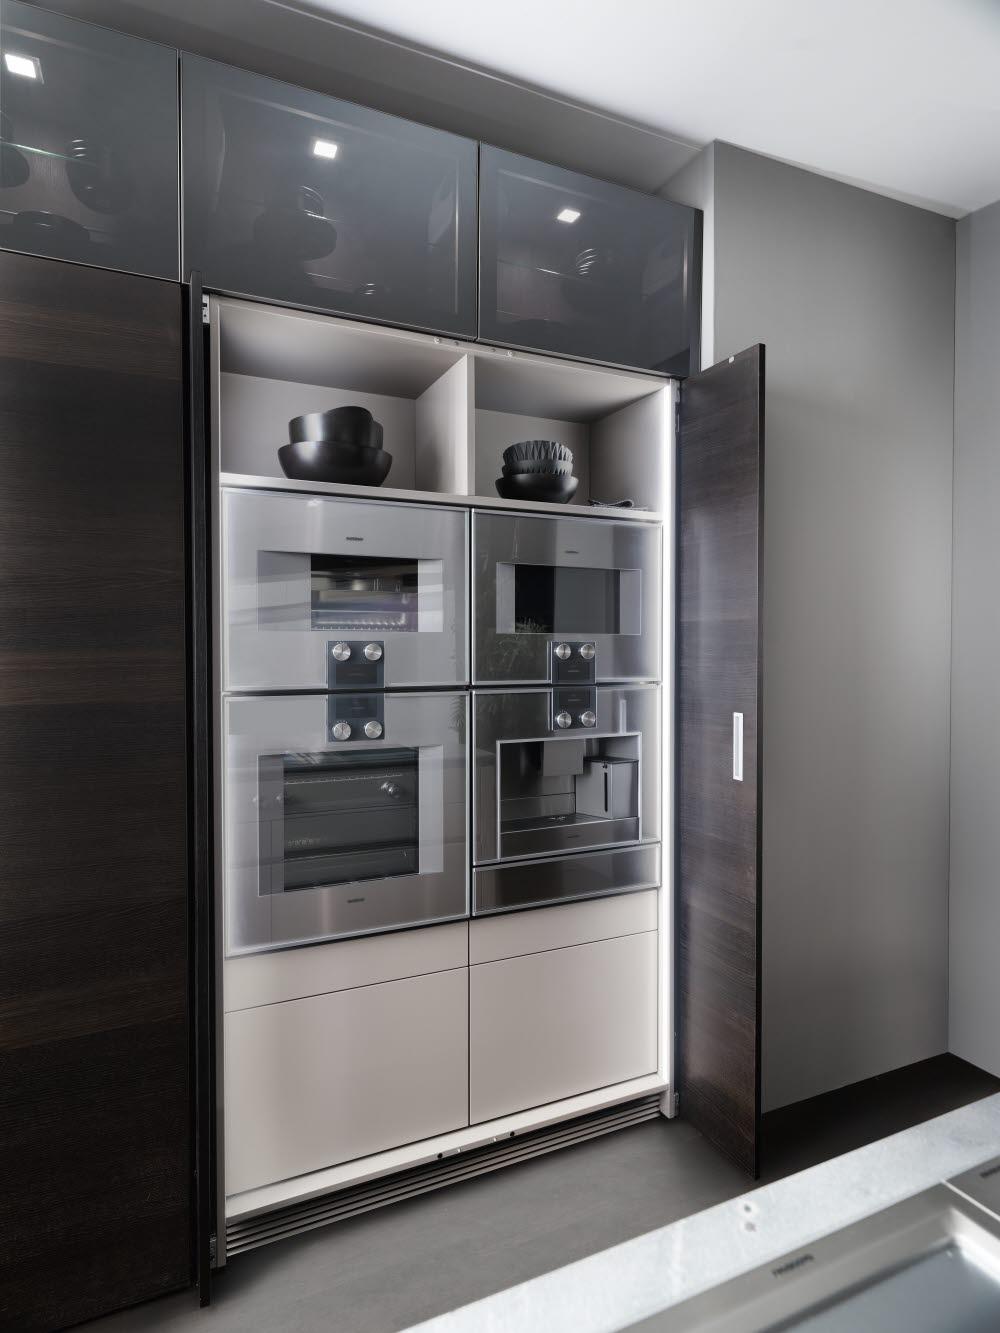 & INTUO - Tall equipment cupboard